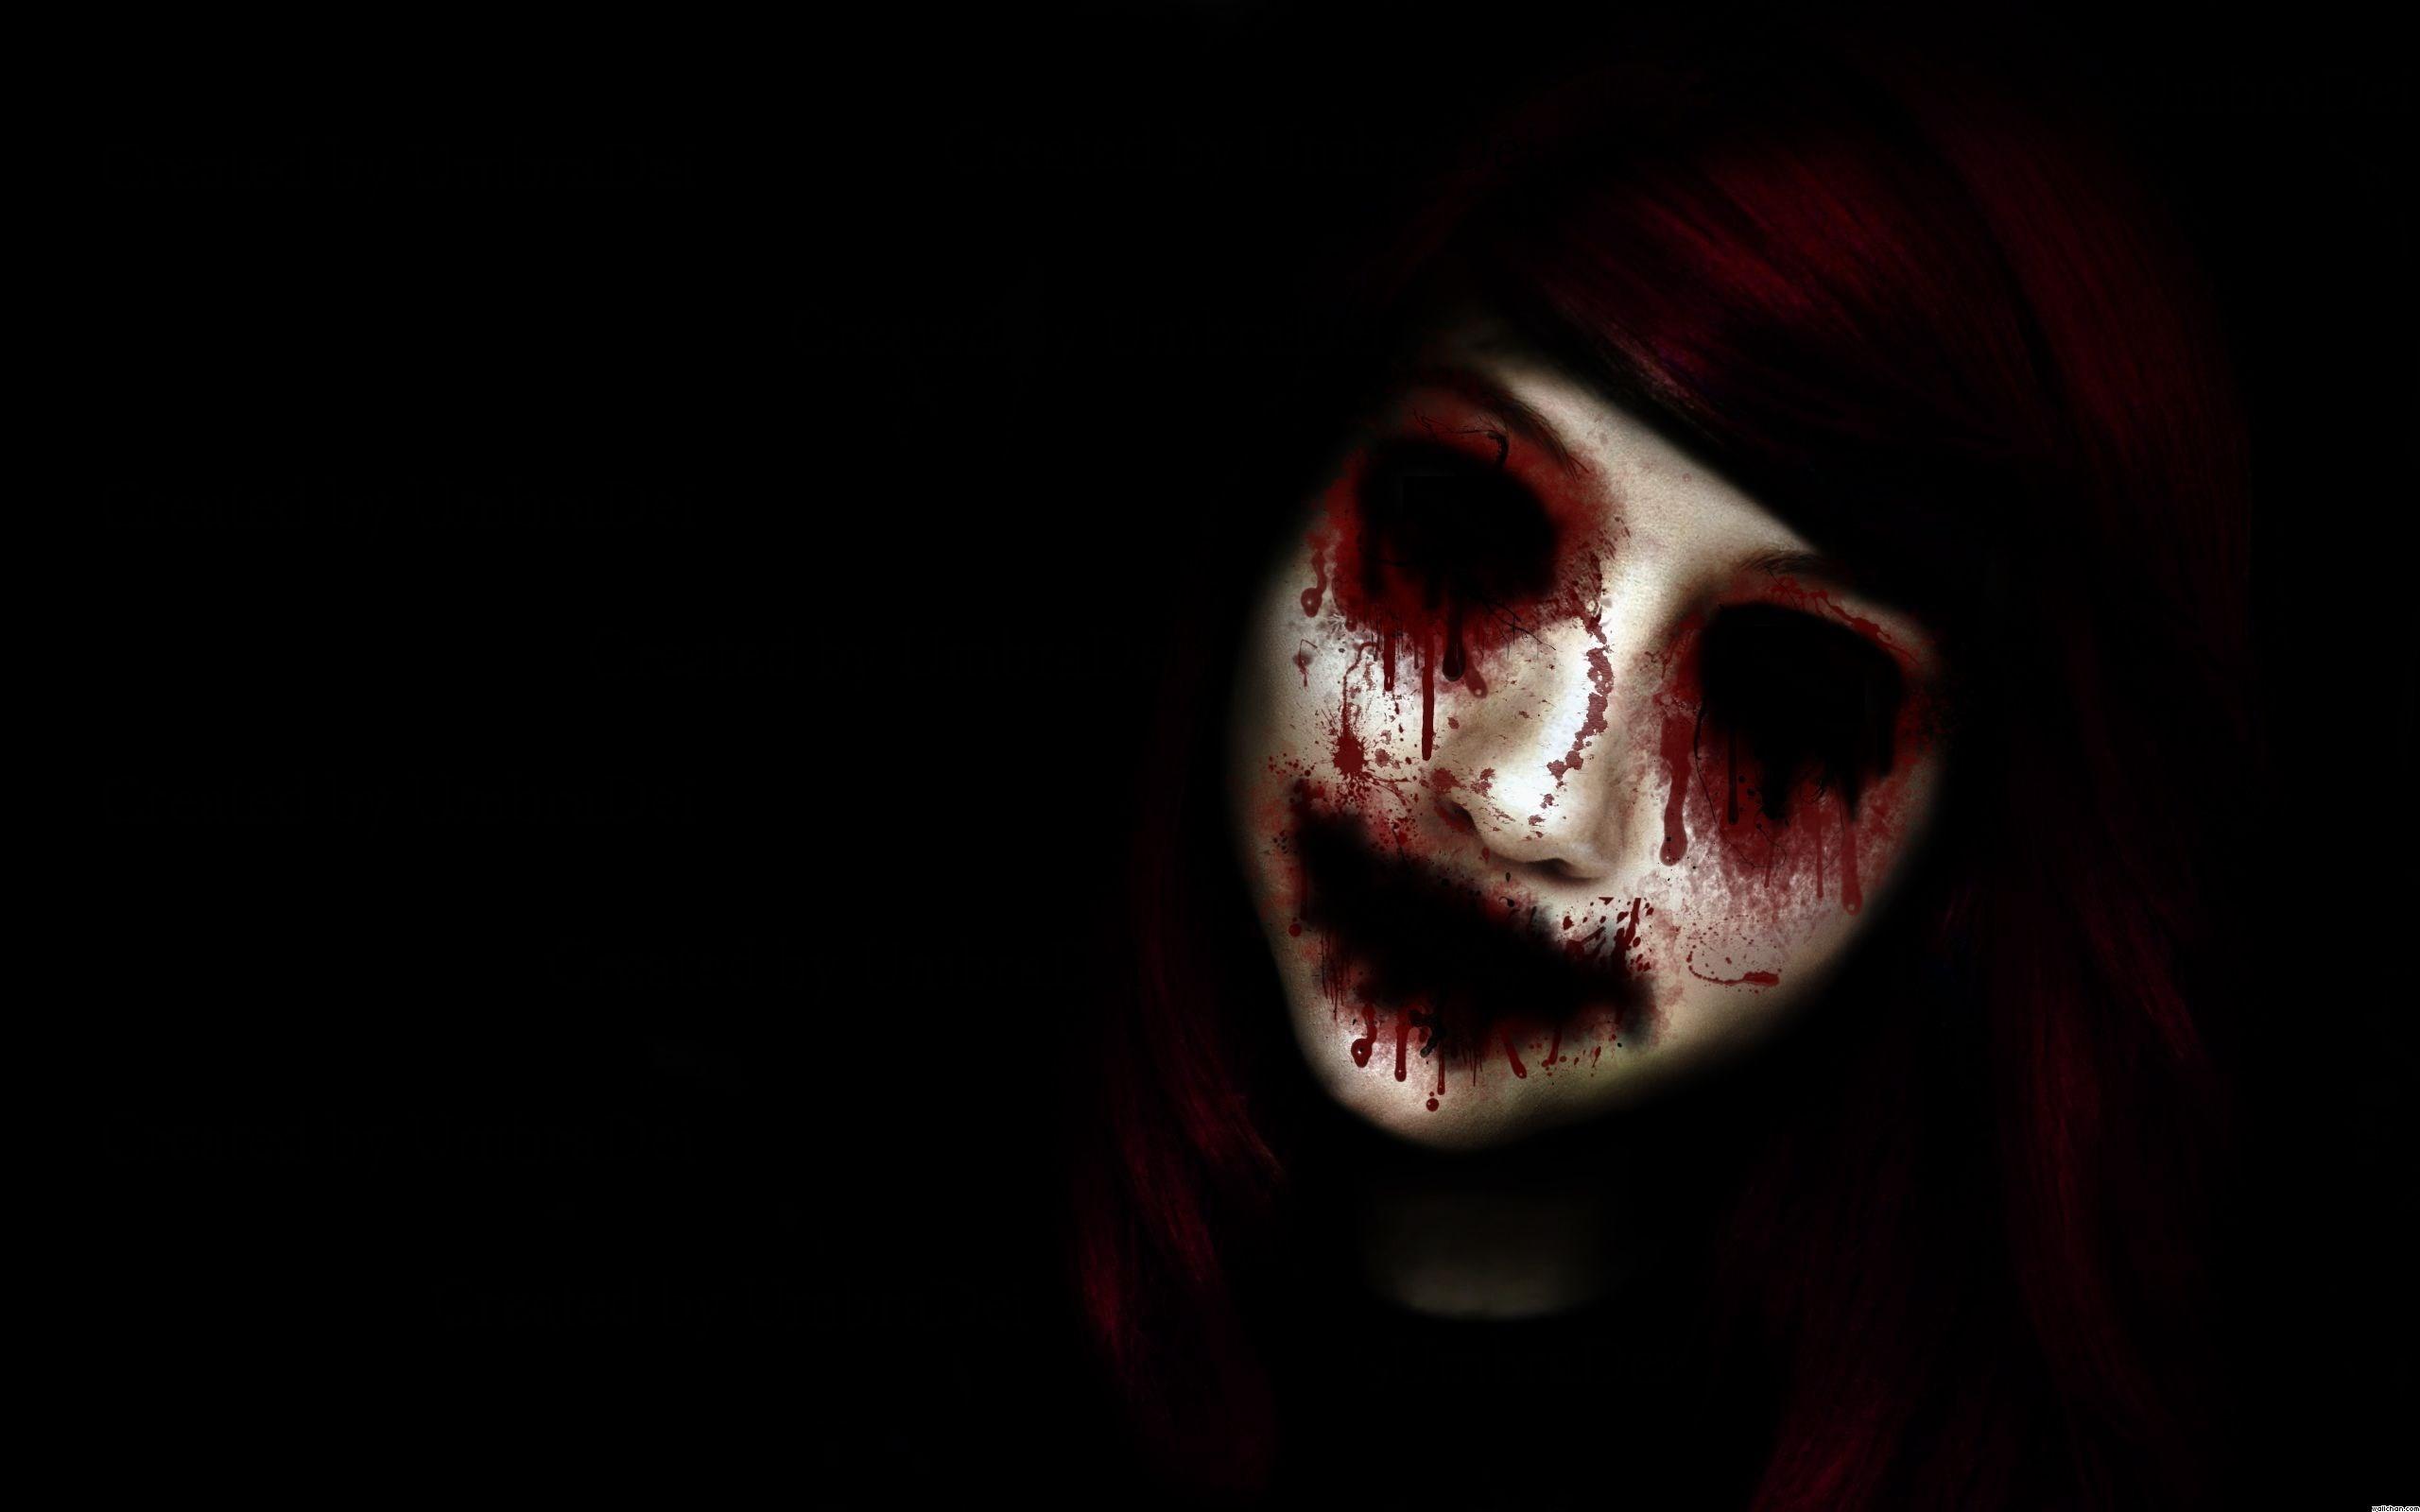 Radburn Gill – horror anime background wallpaper free – 2560 x 1600 px